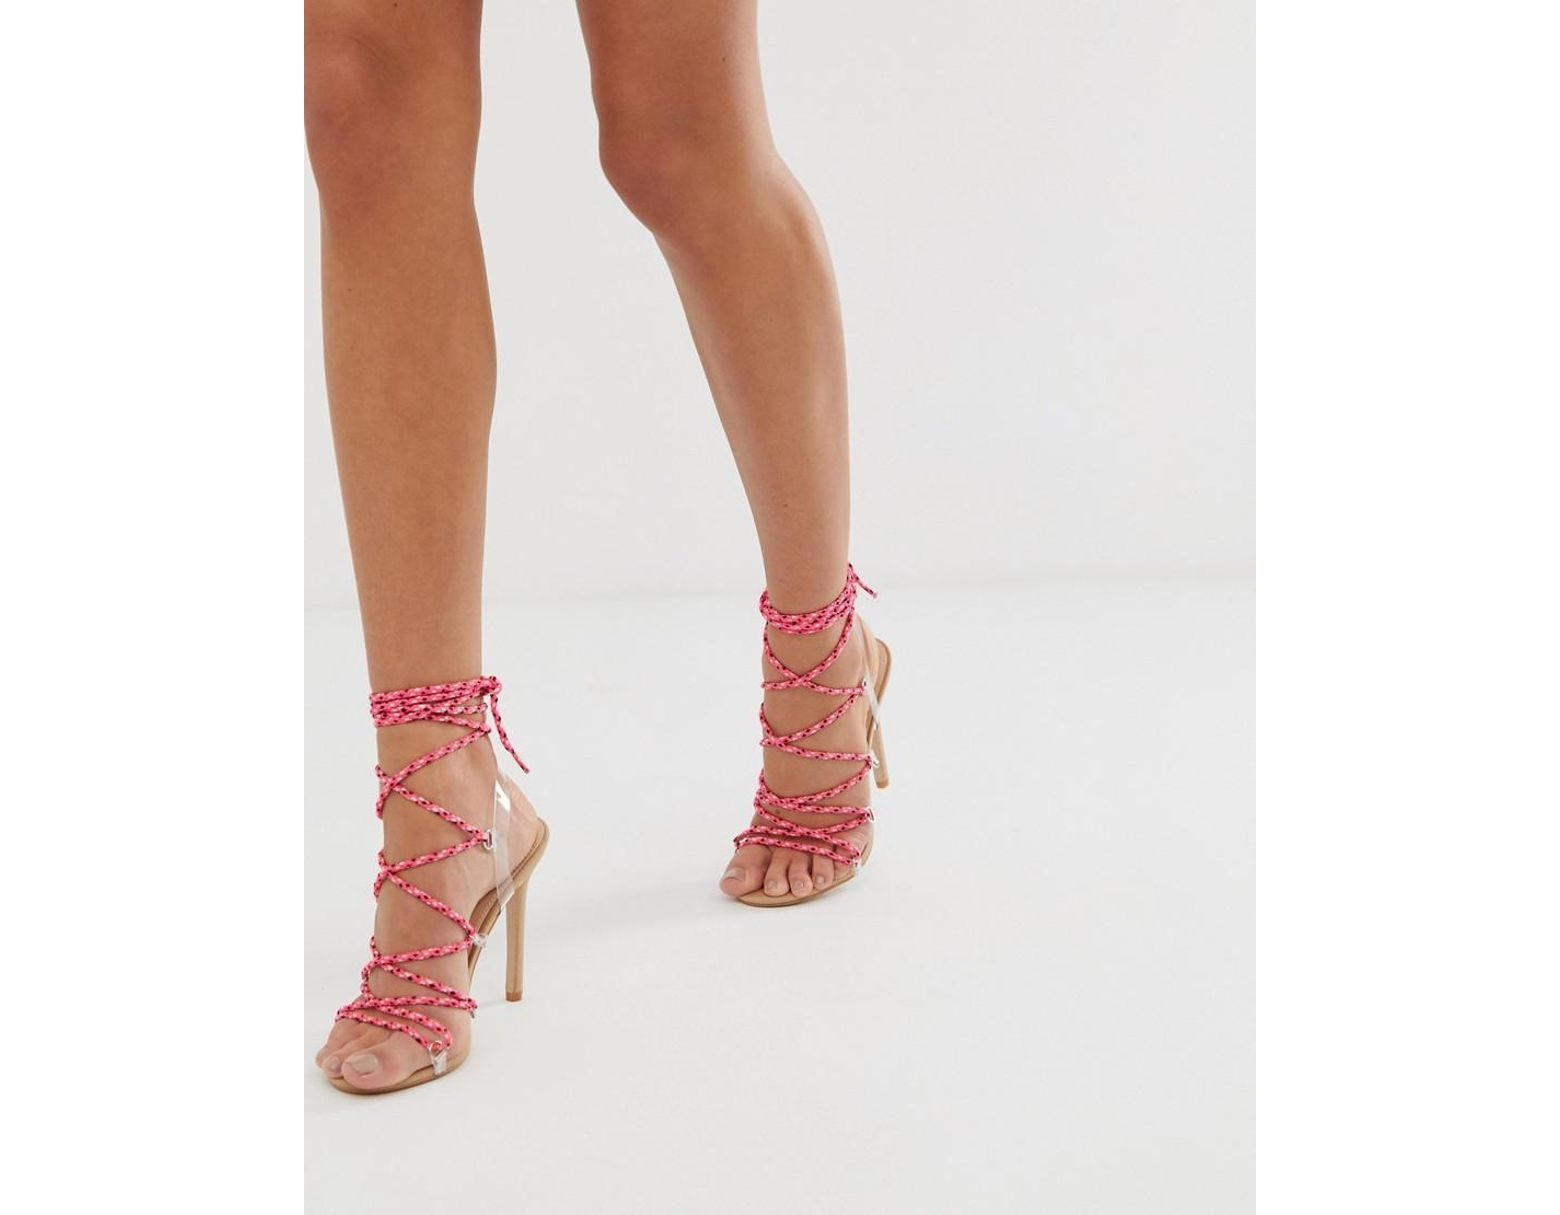 14a601bf682 Women's Pink Playa Blush Tie Up Heeled Sandals